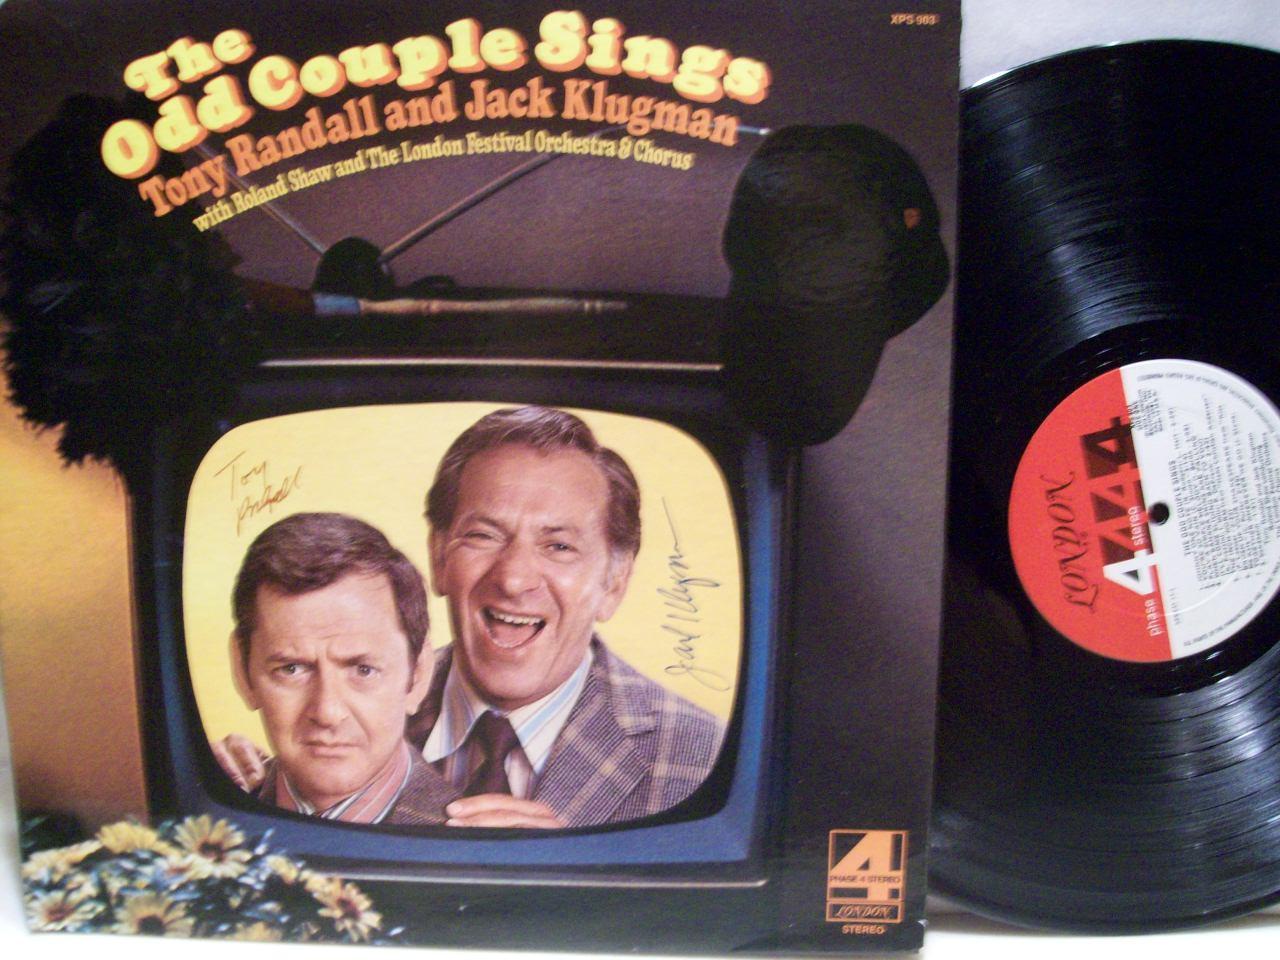 Randall, Tony Jack Klugman LP Signed Autograph The Odd Couple 1973